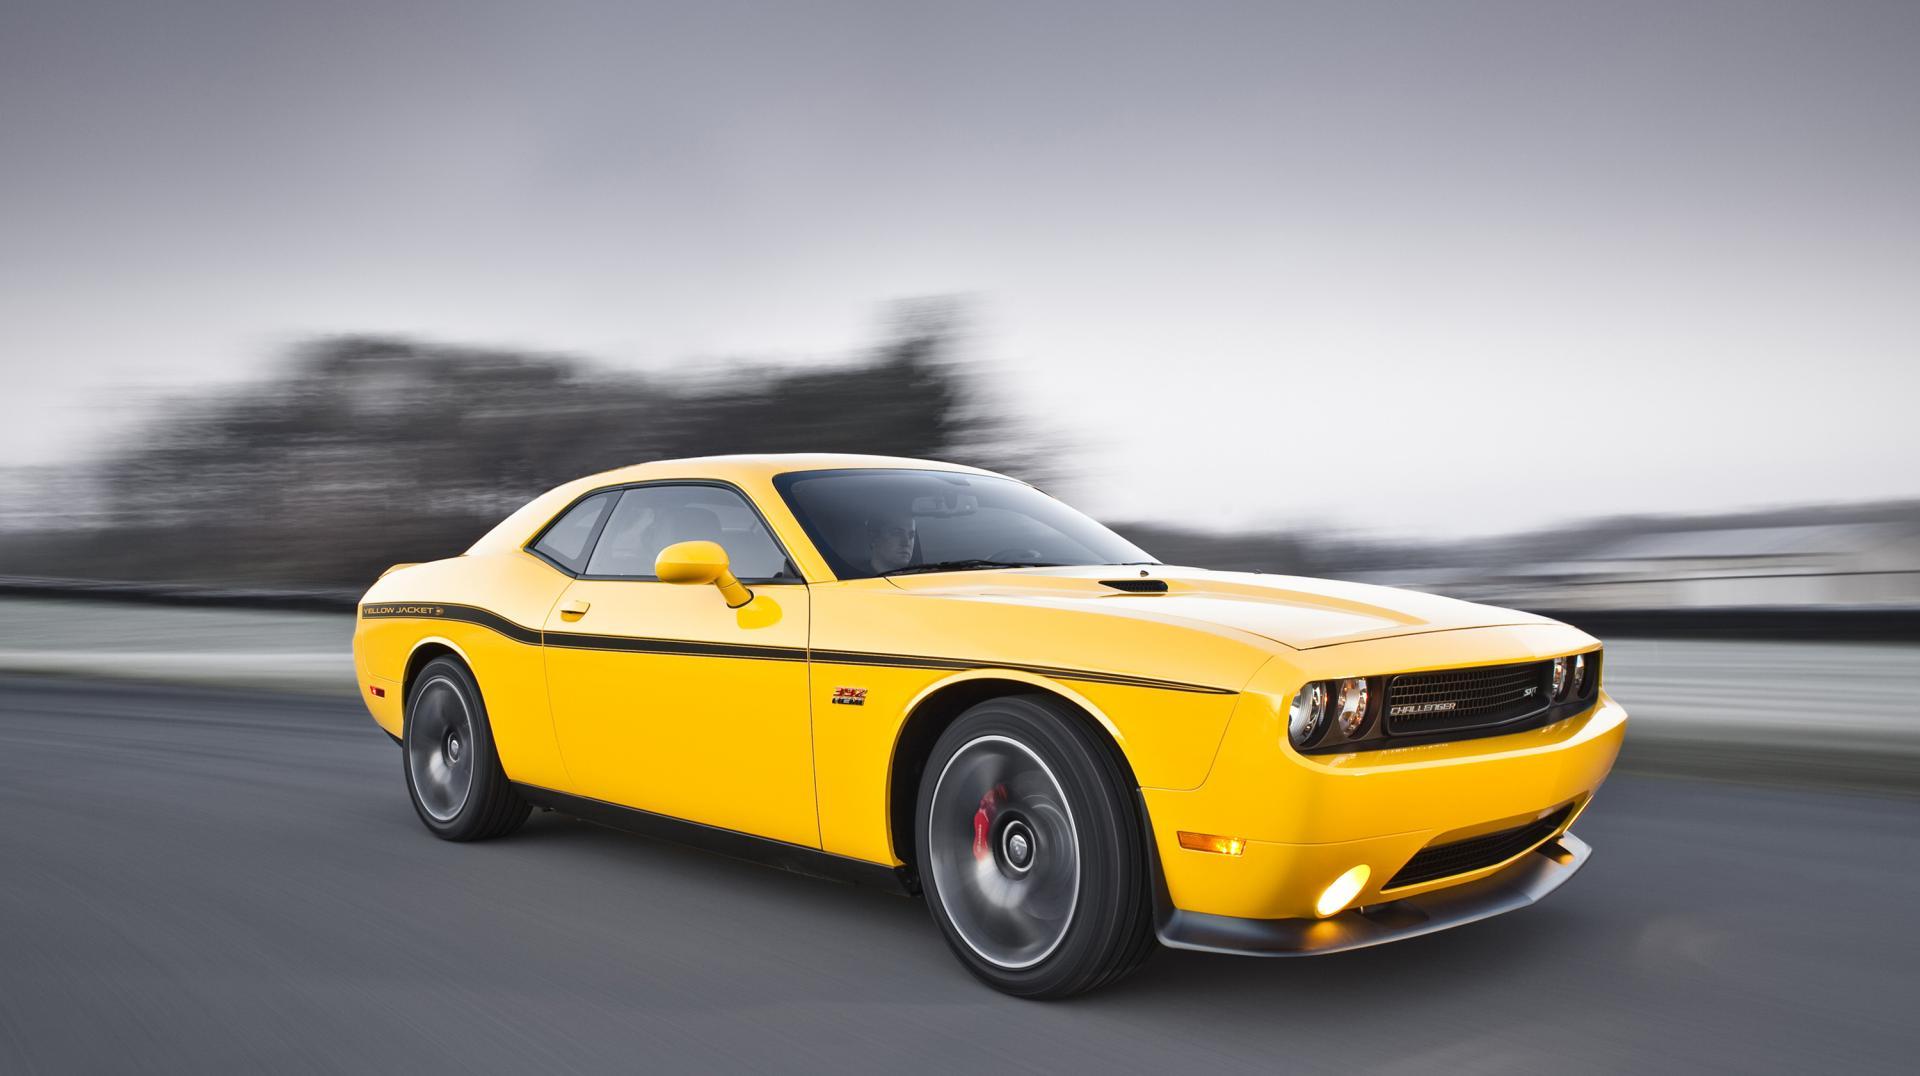 2012 Dodge Challenger Srt8 392 Yellow Jacket News And Information Conceptcarz Com